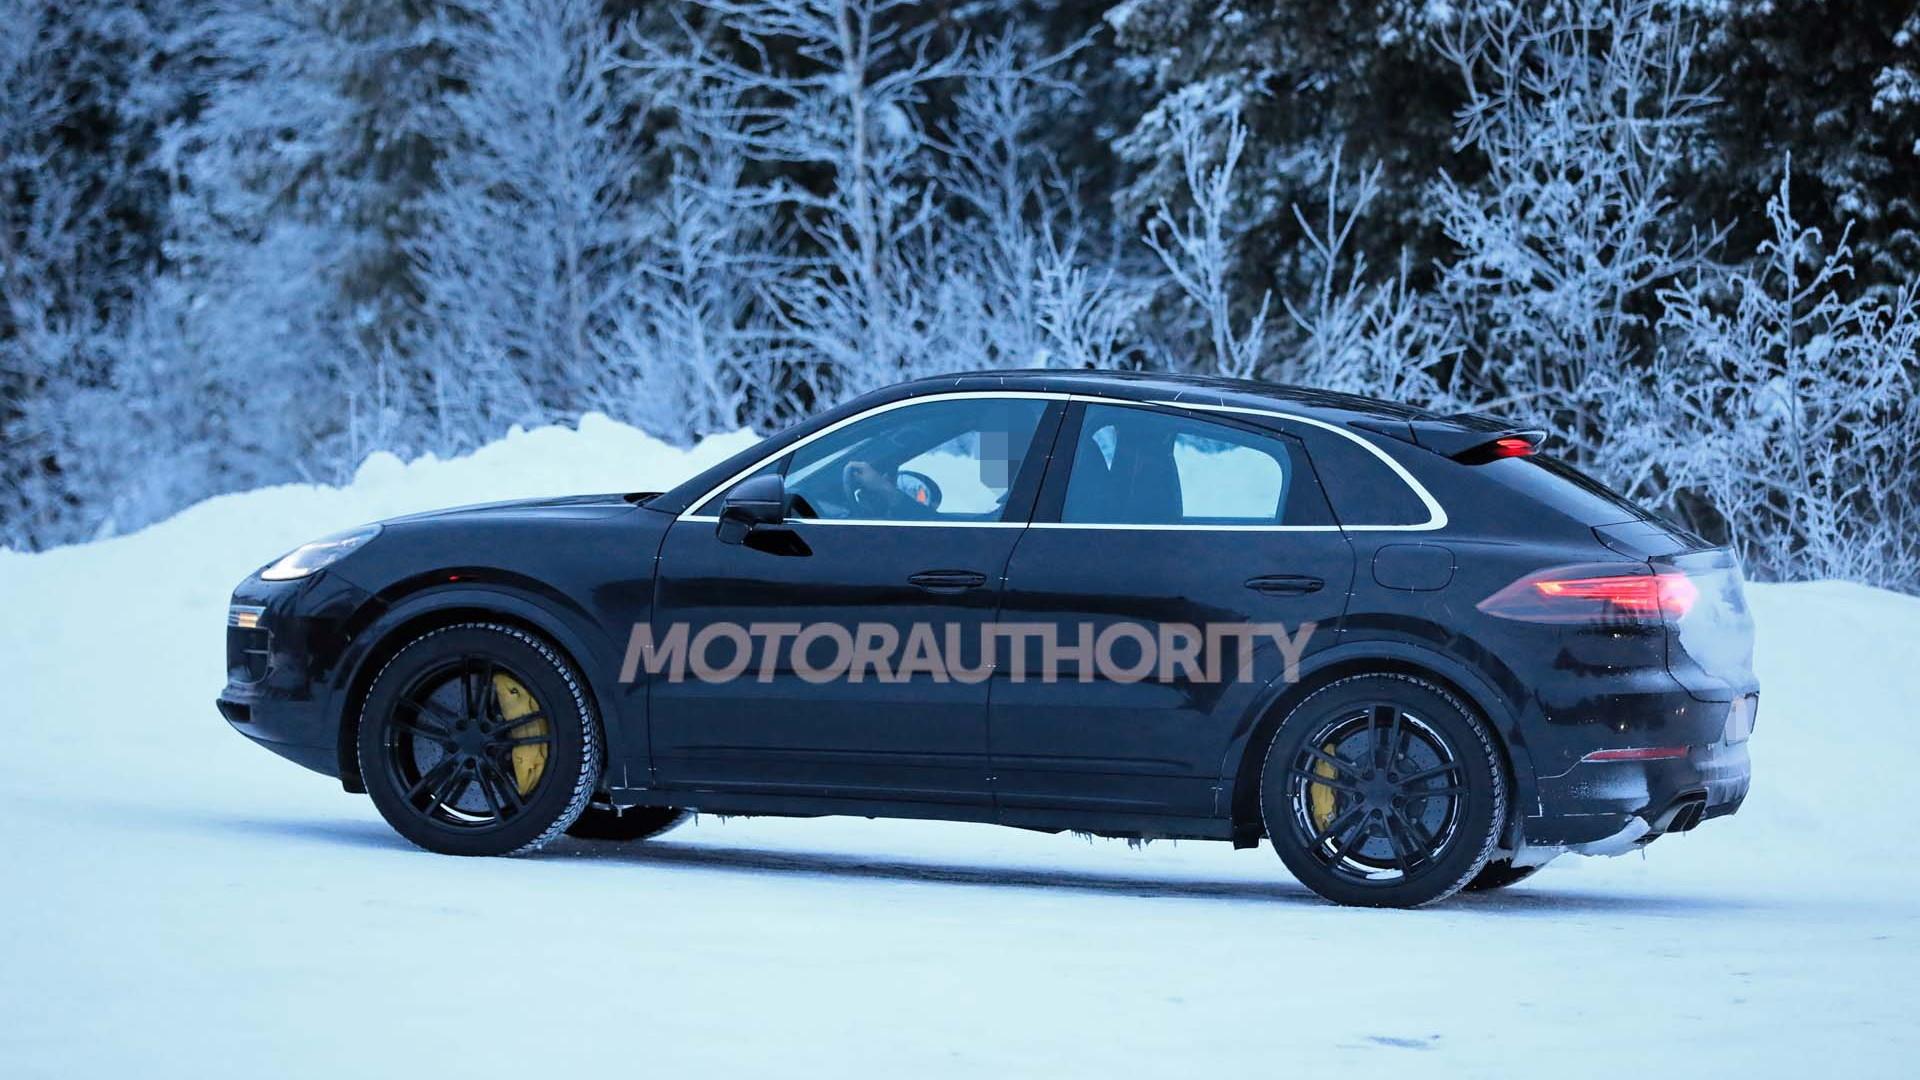 2020 Porsche Cayenne Coupe Turbo spy shots